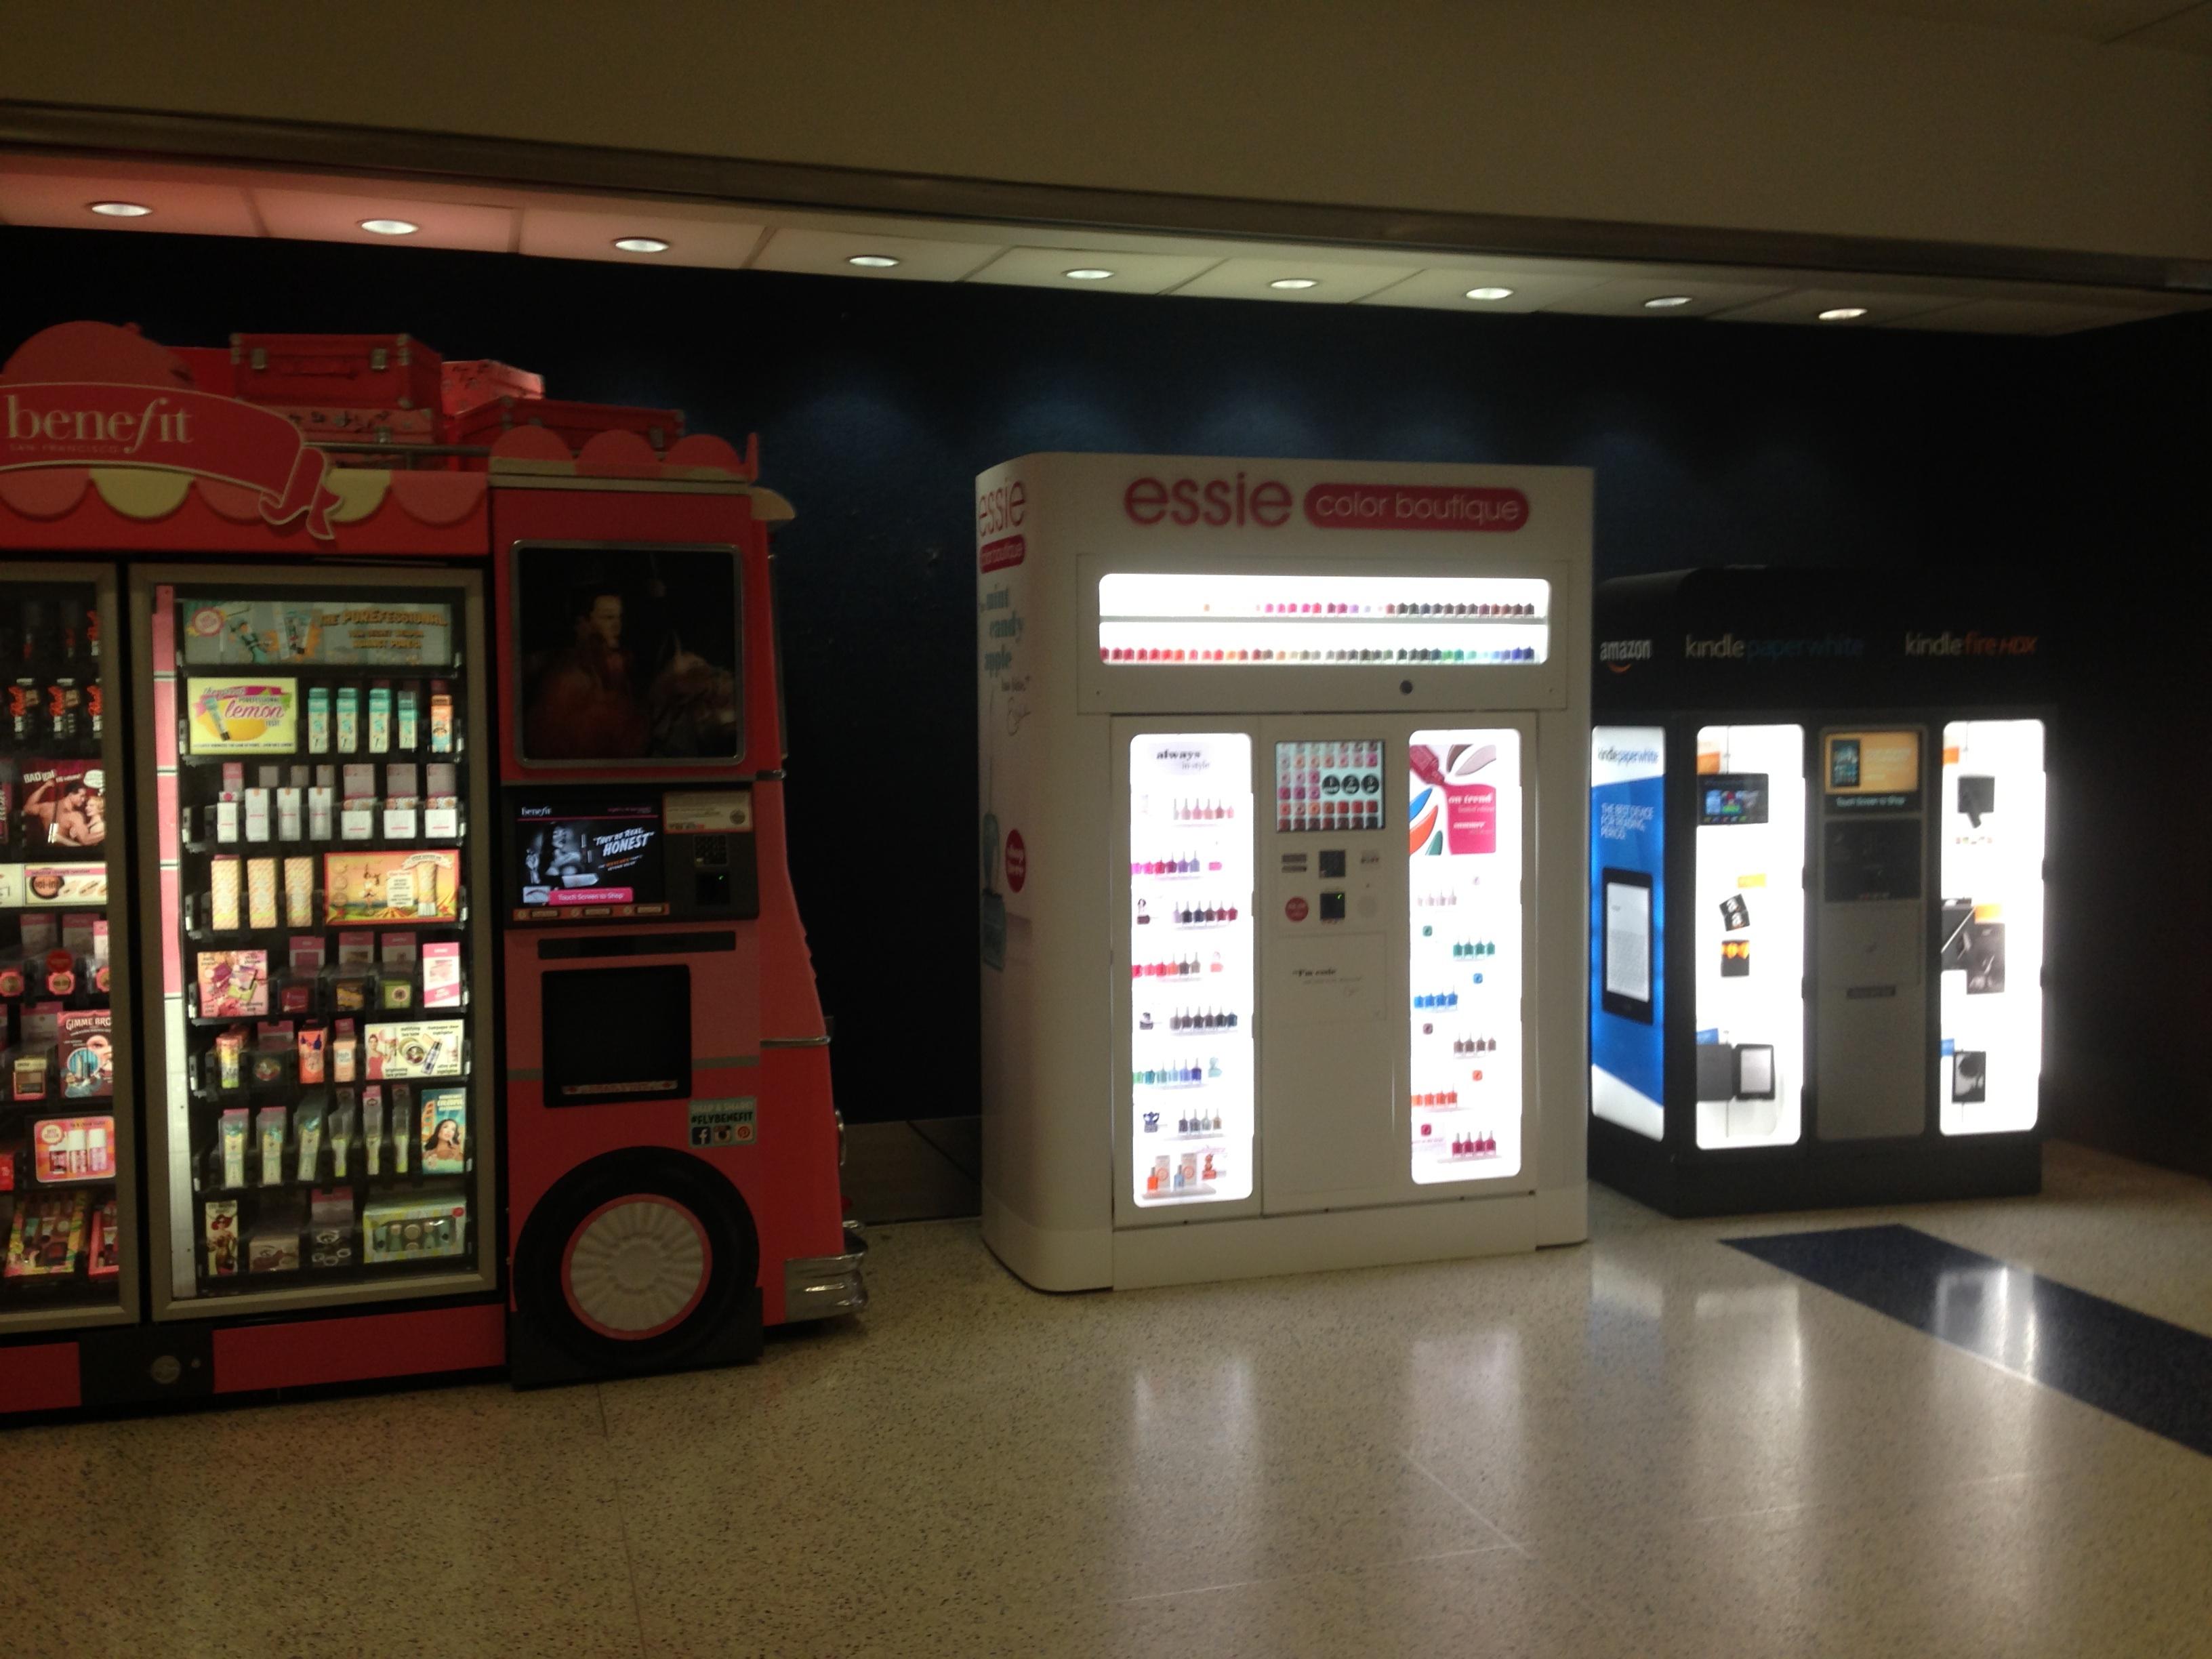 vending machine houston tx